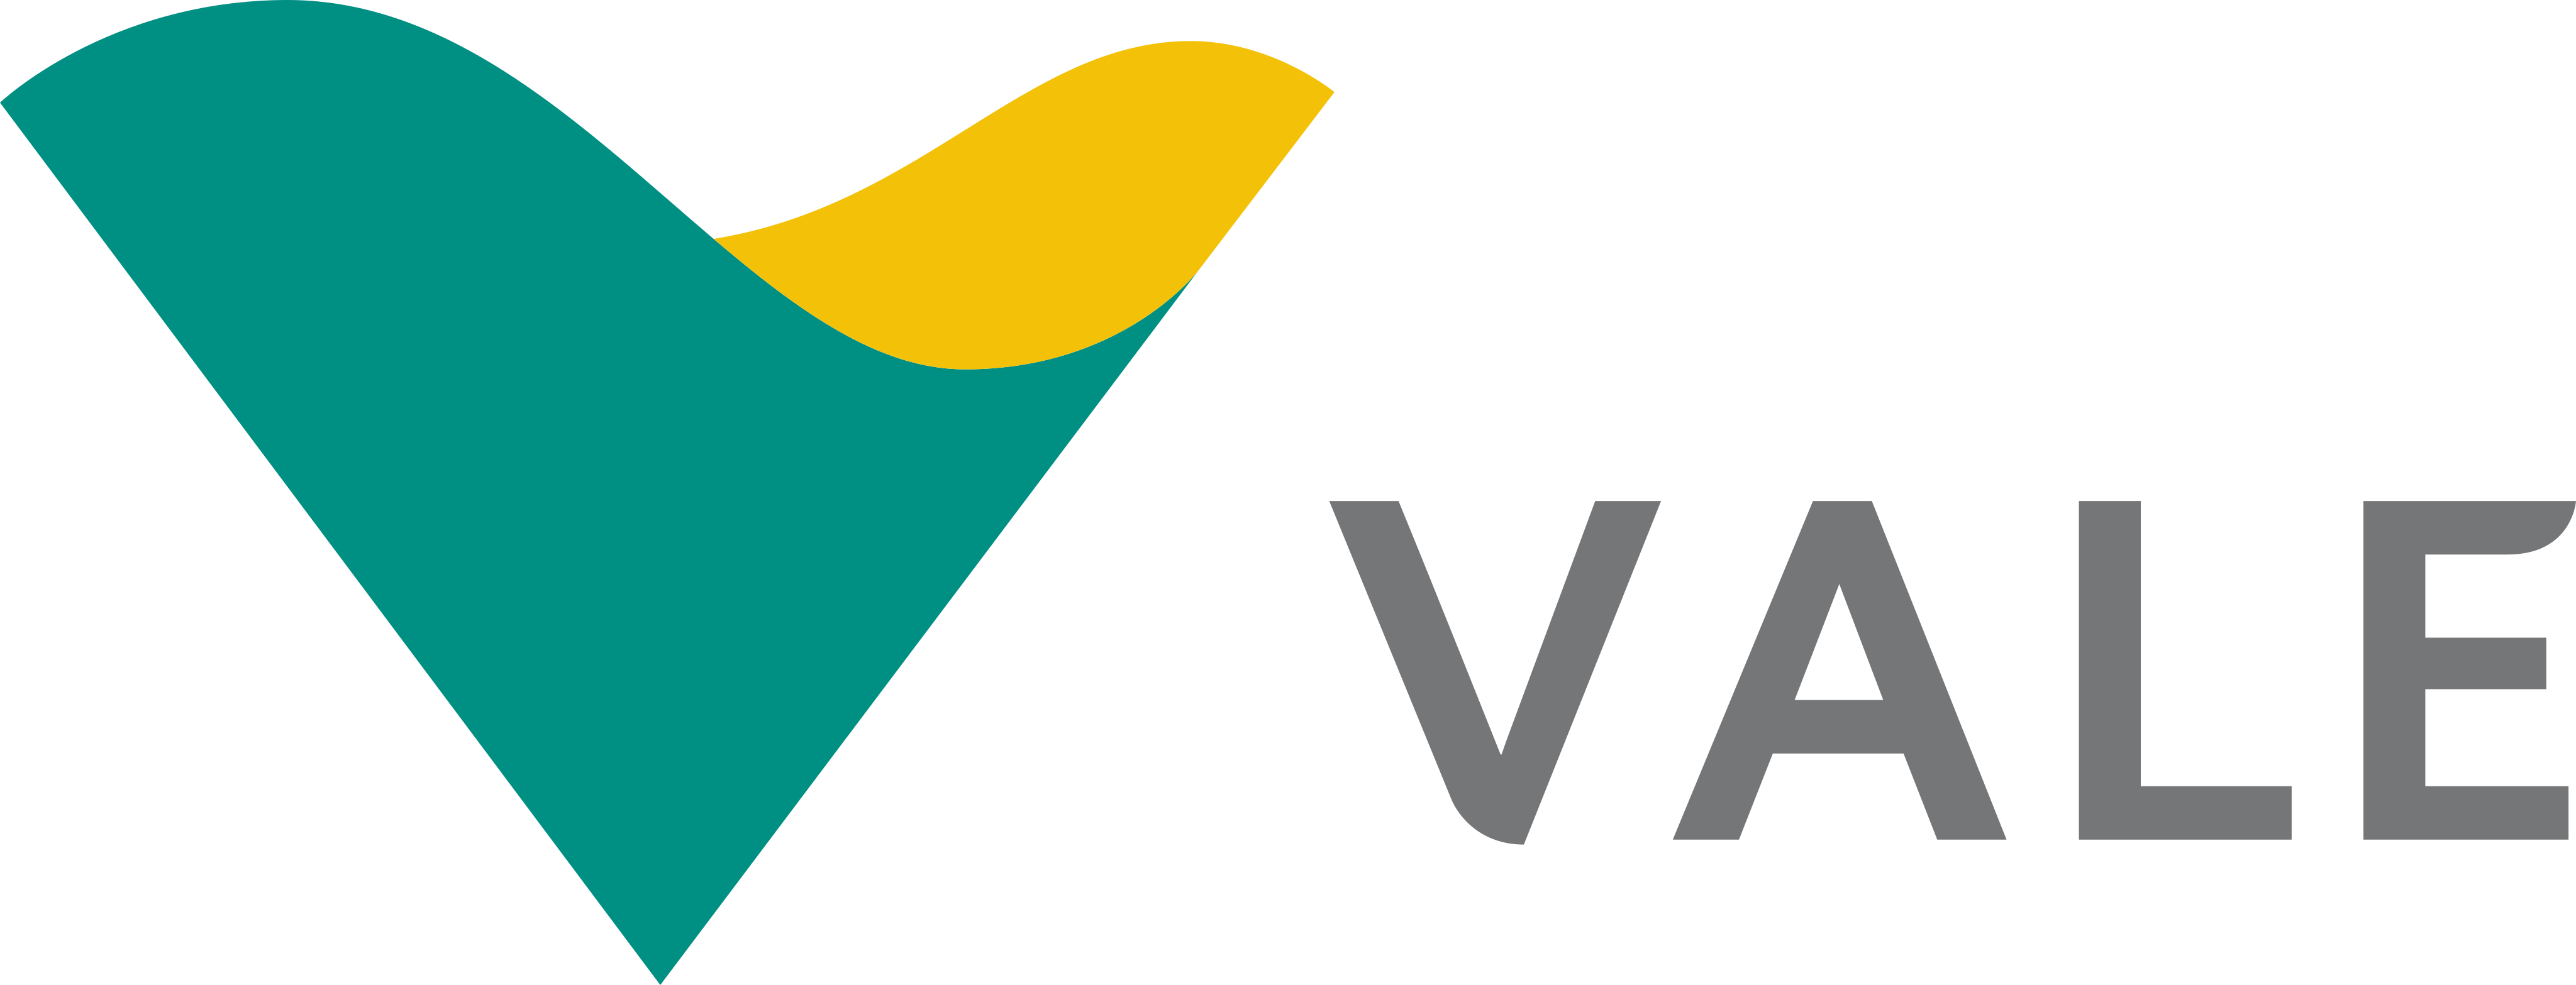 Vale Logo – Mineradora - PNG e Vetor - Download de Logo